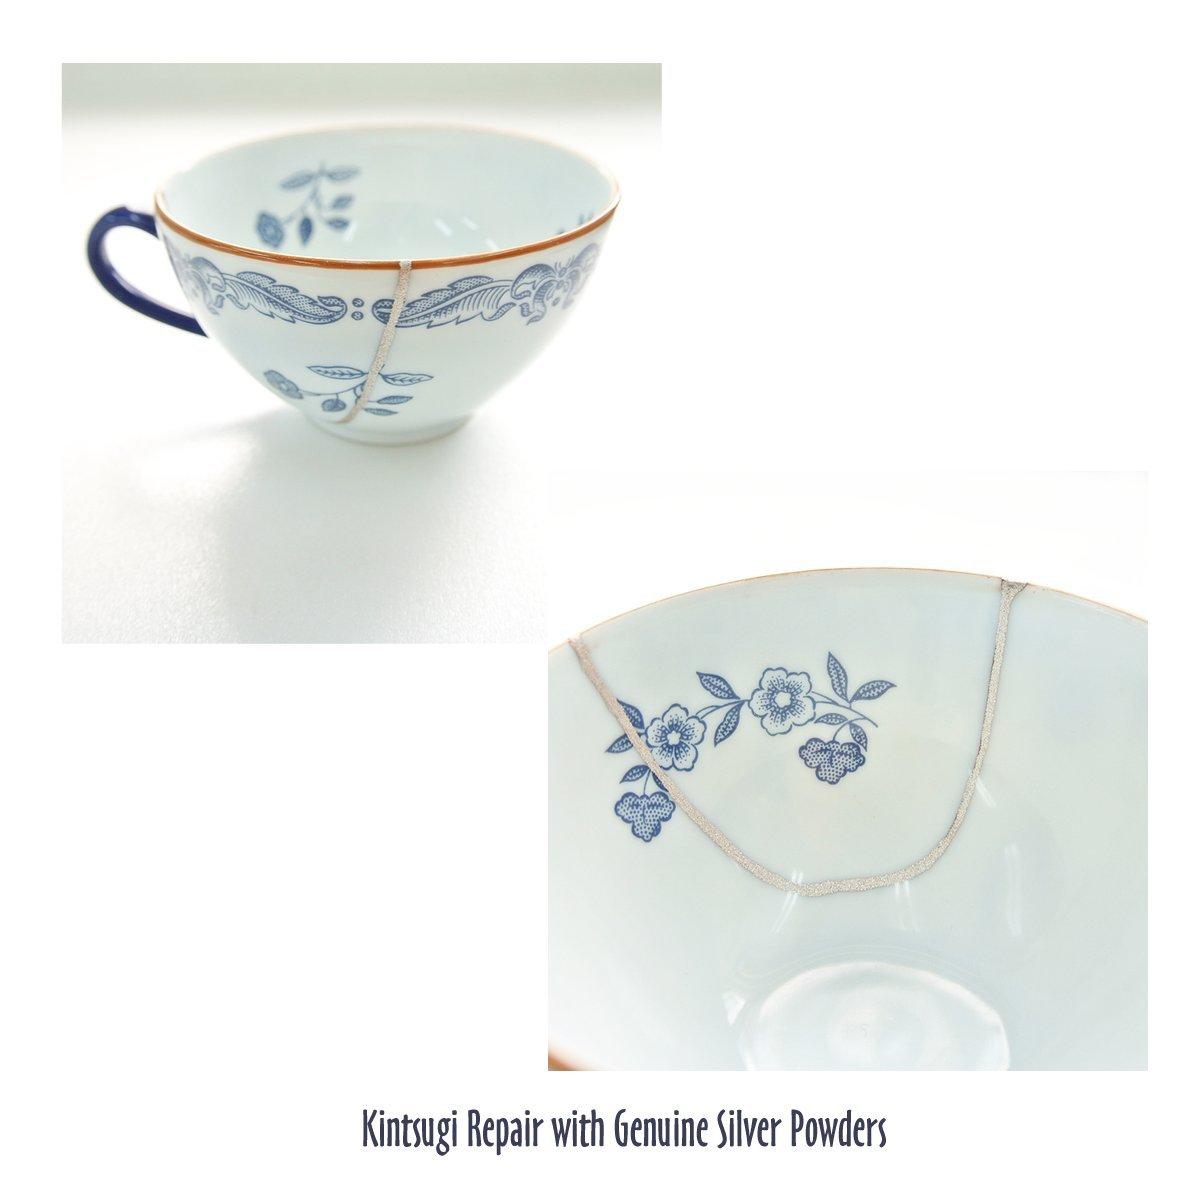 Kintsugi Repair Kit - Japanese Urushi Lacquer from Japan, Kintsukuroi by Mejiro Co. (Image #8)